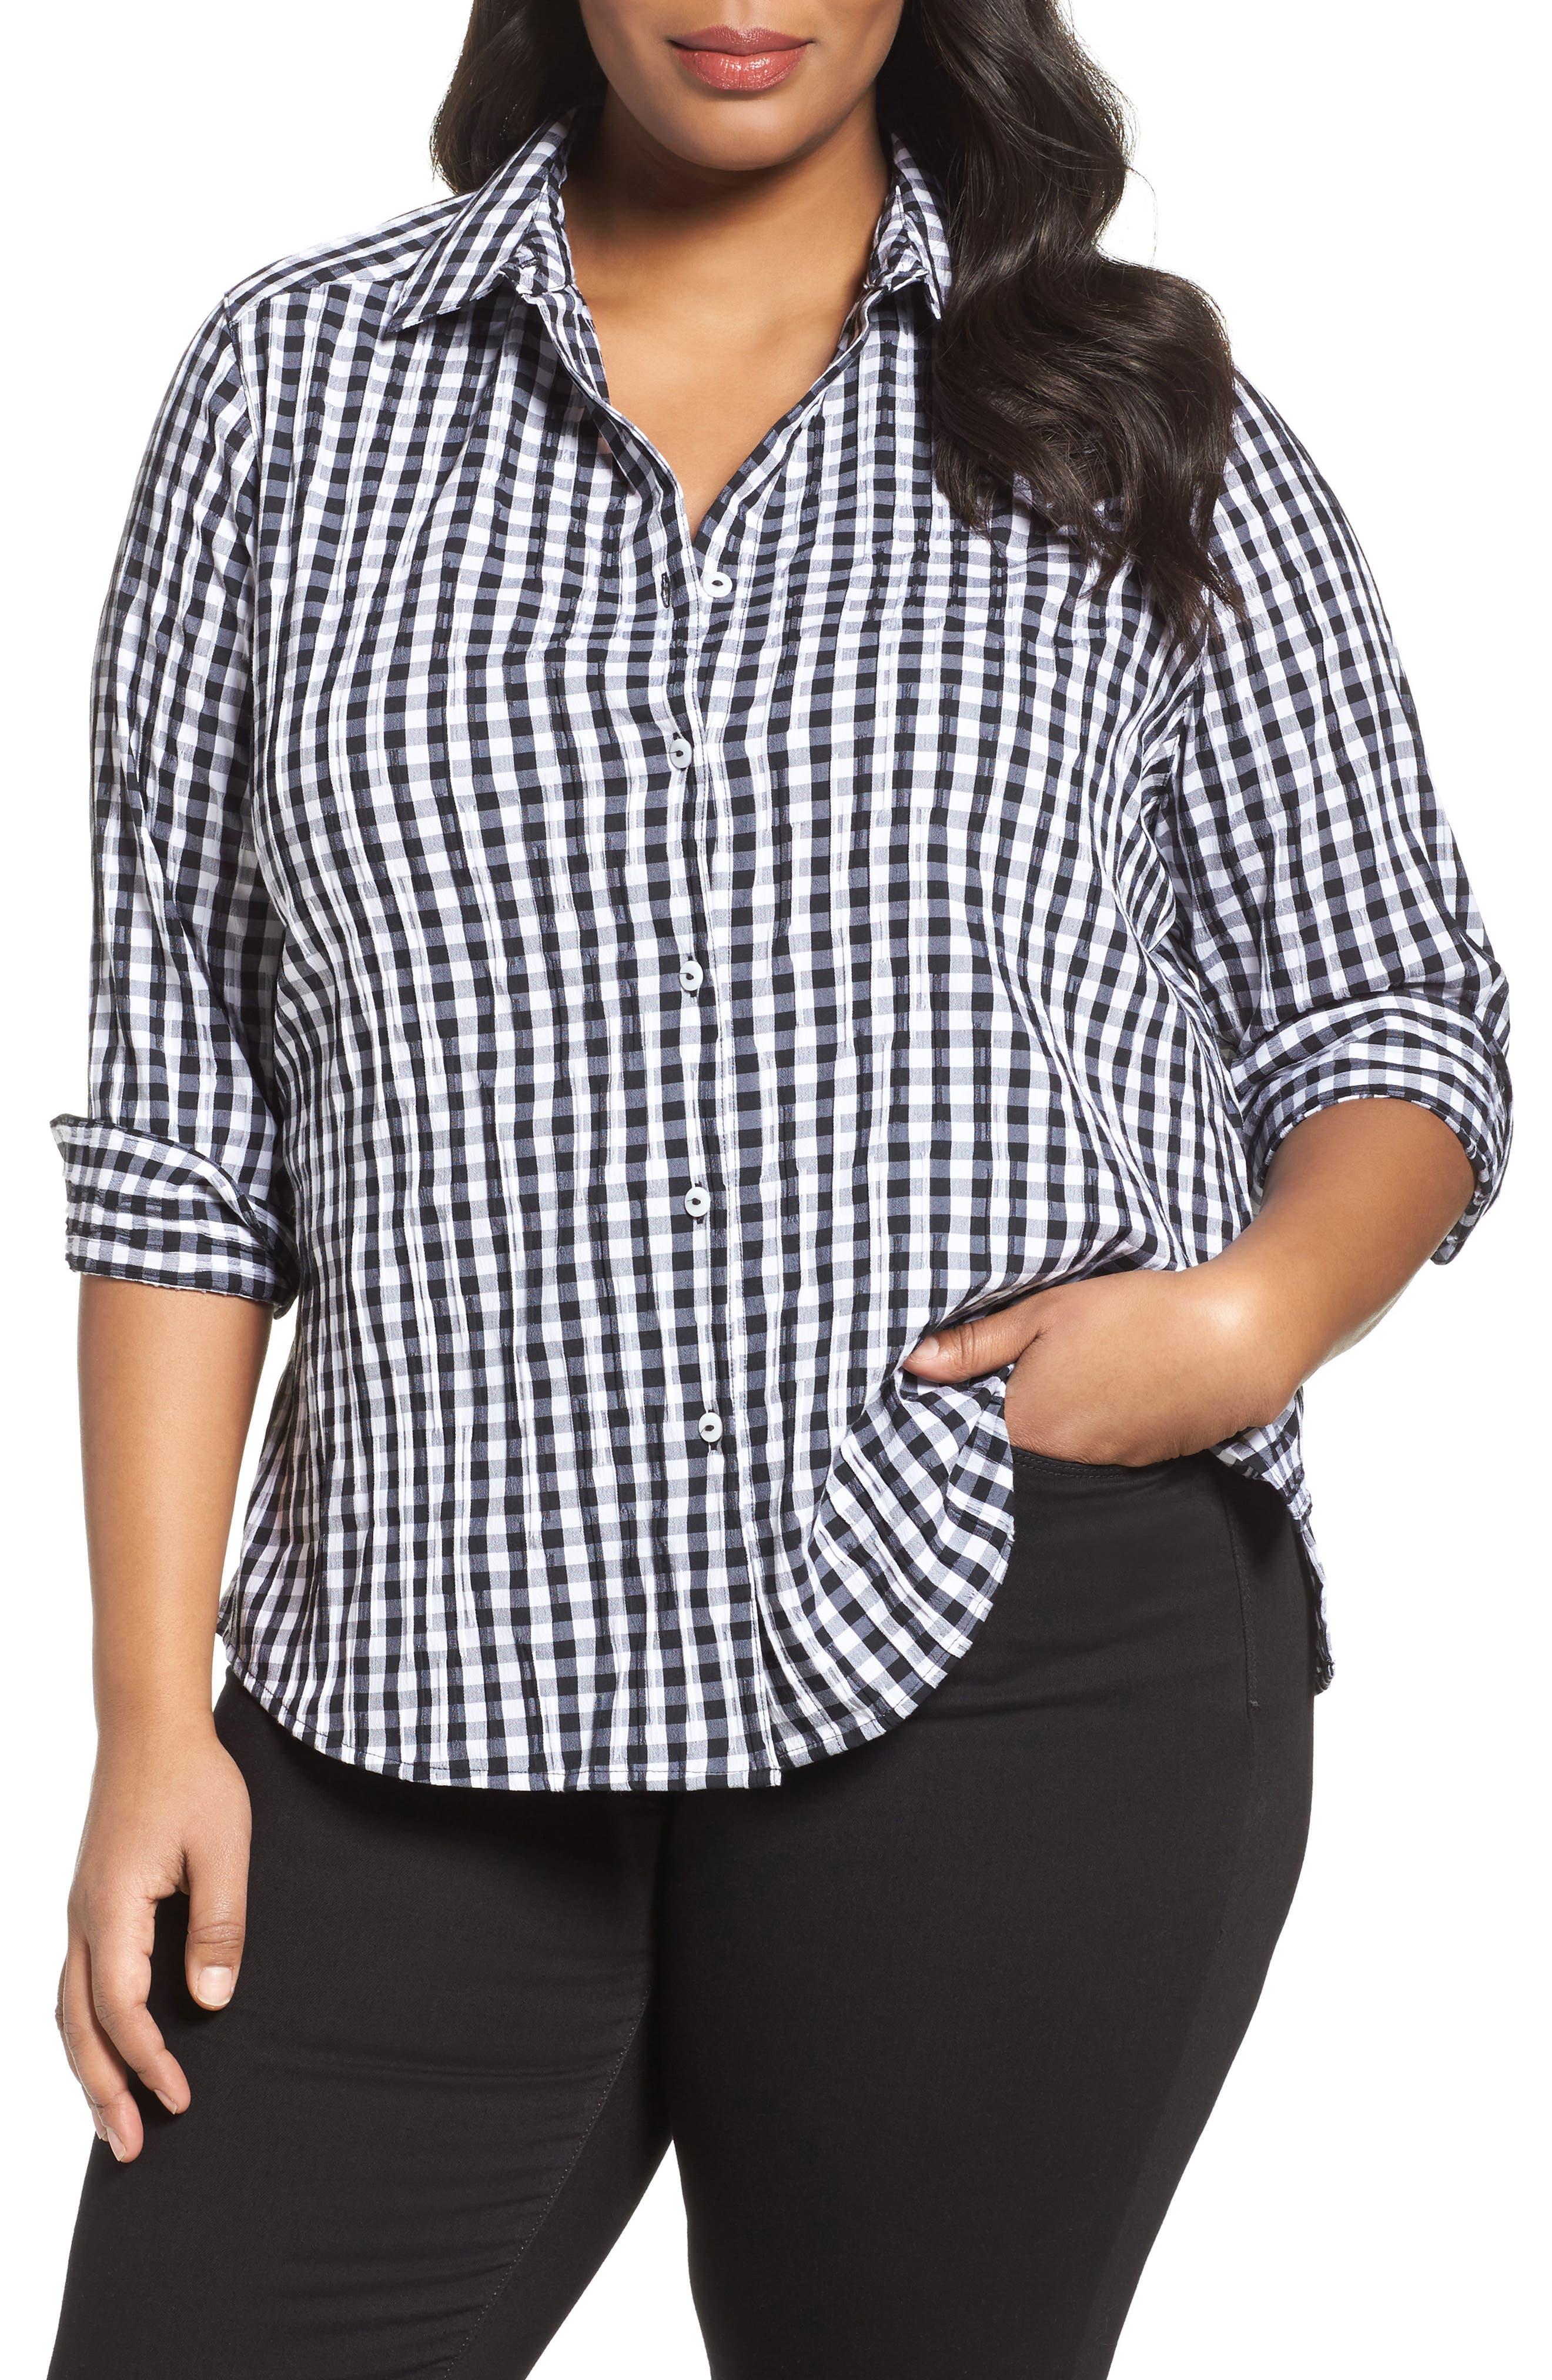 Alternate Image 1 Selected - Foxcroft Gingham Shirt (Plus Size)